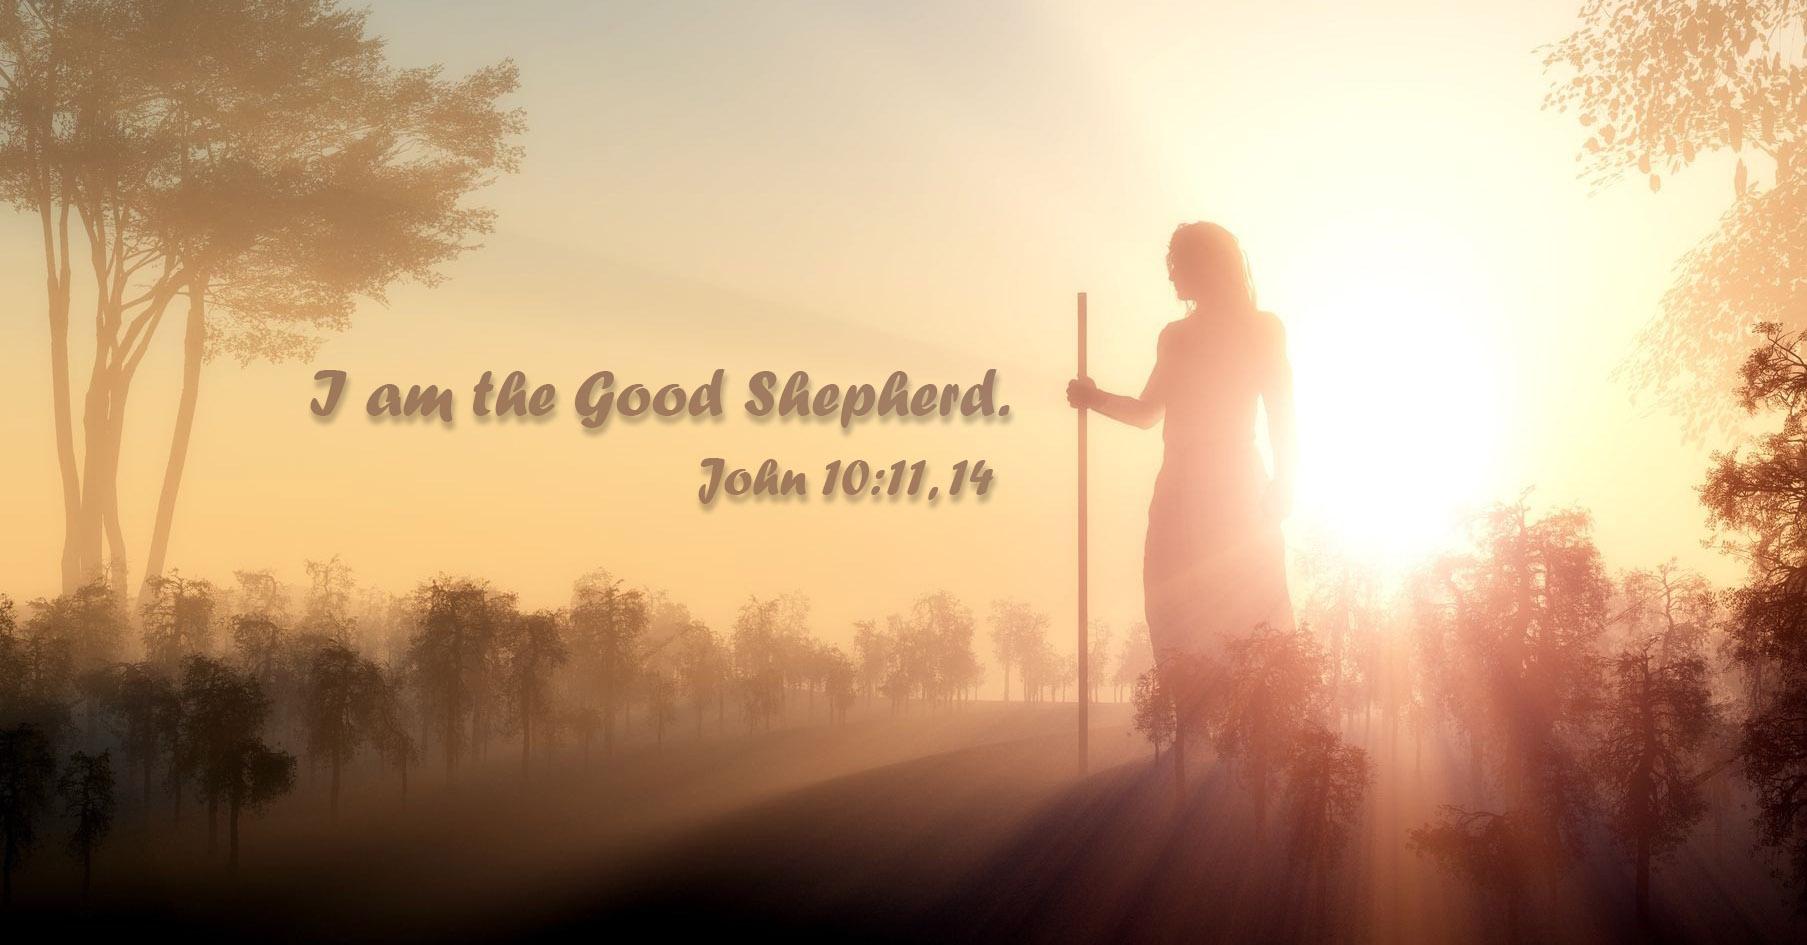 I am the good shepherd. John 10:11, John 10:14